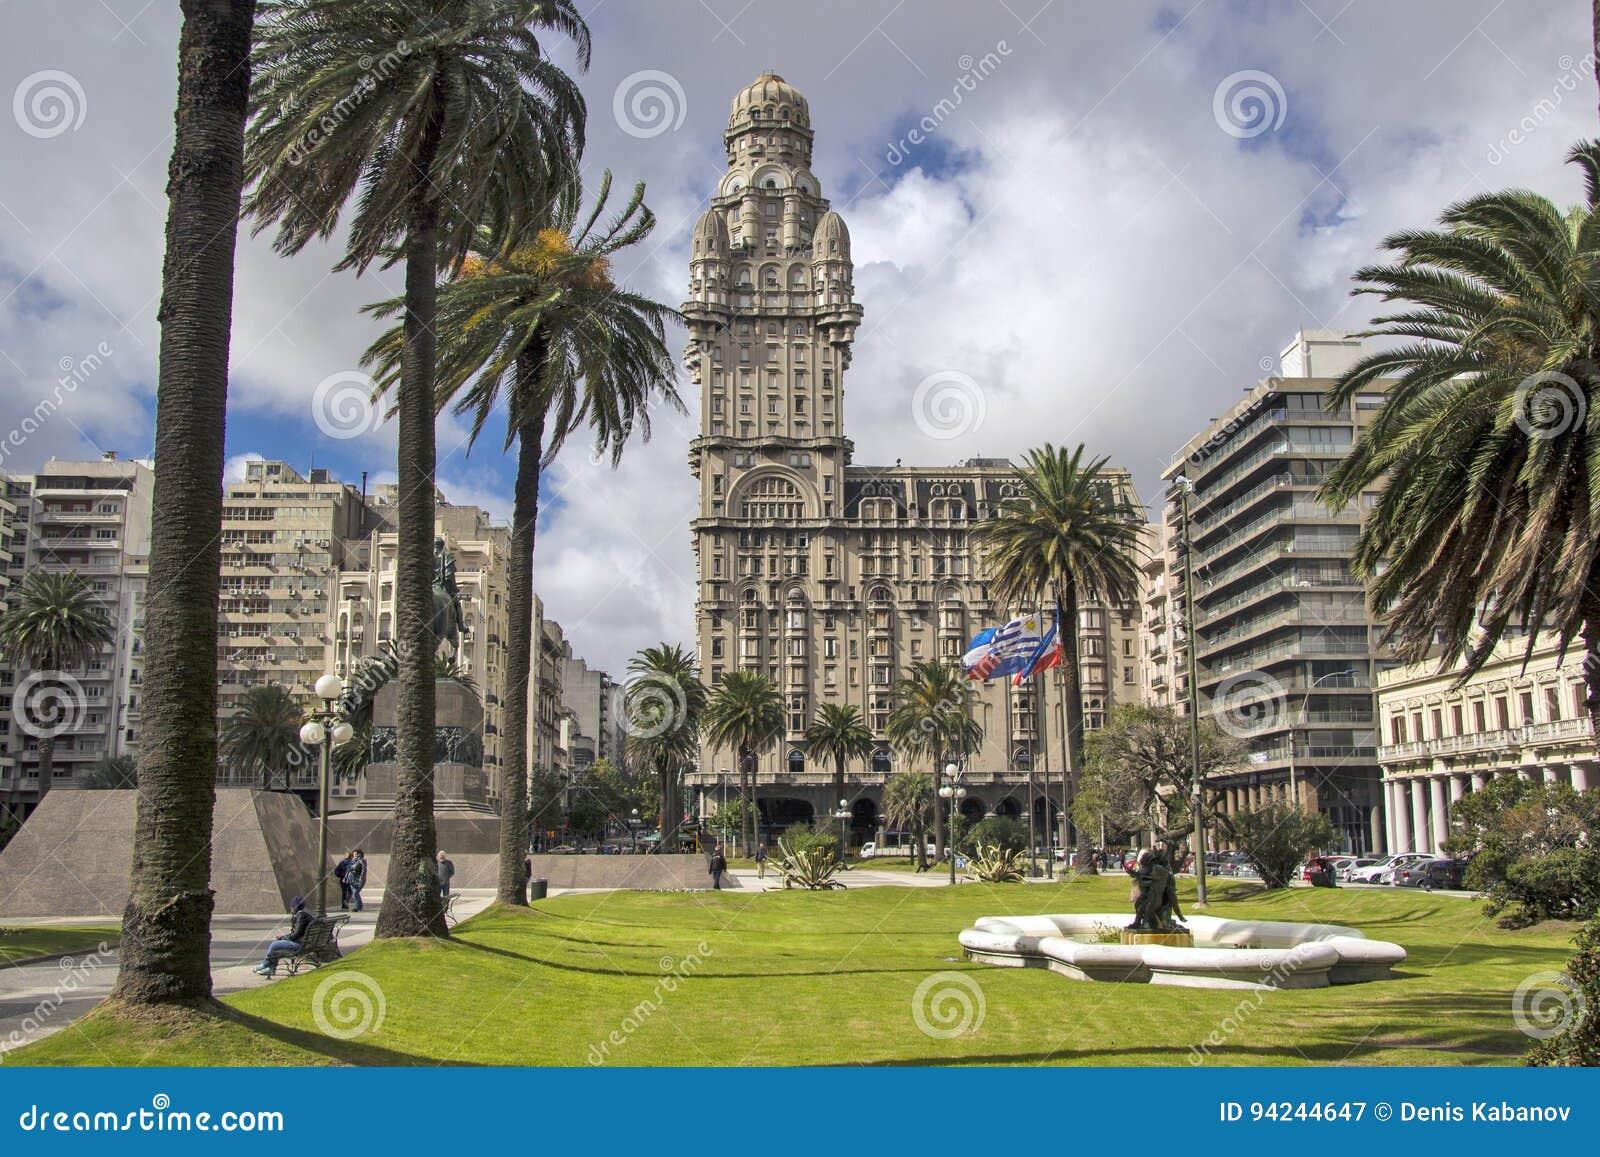 Uruguai - Montevideo - Salvo Palace Palacio centralmente encontrado S